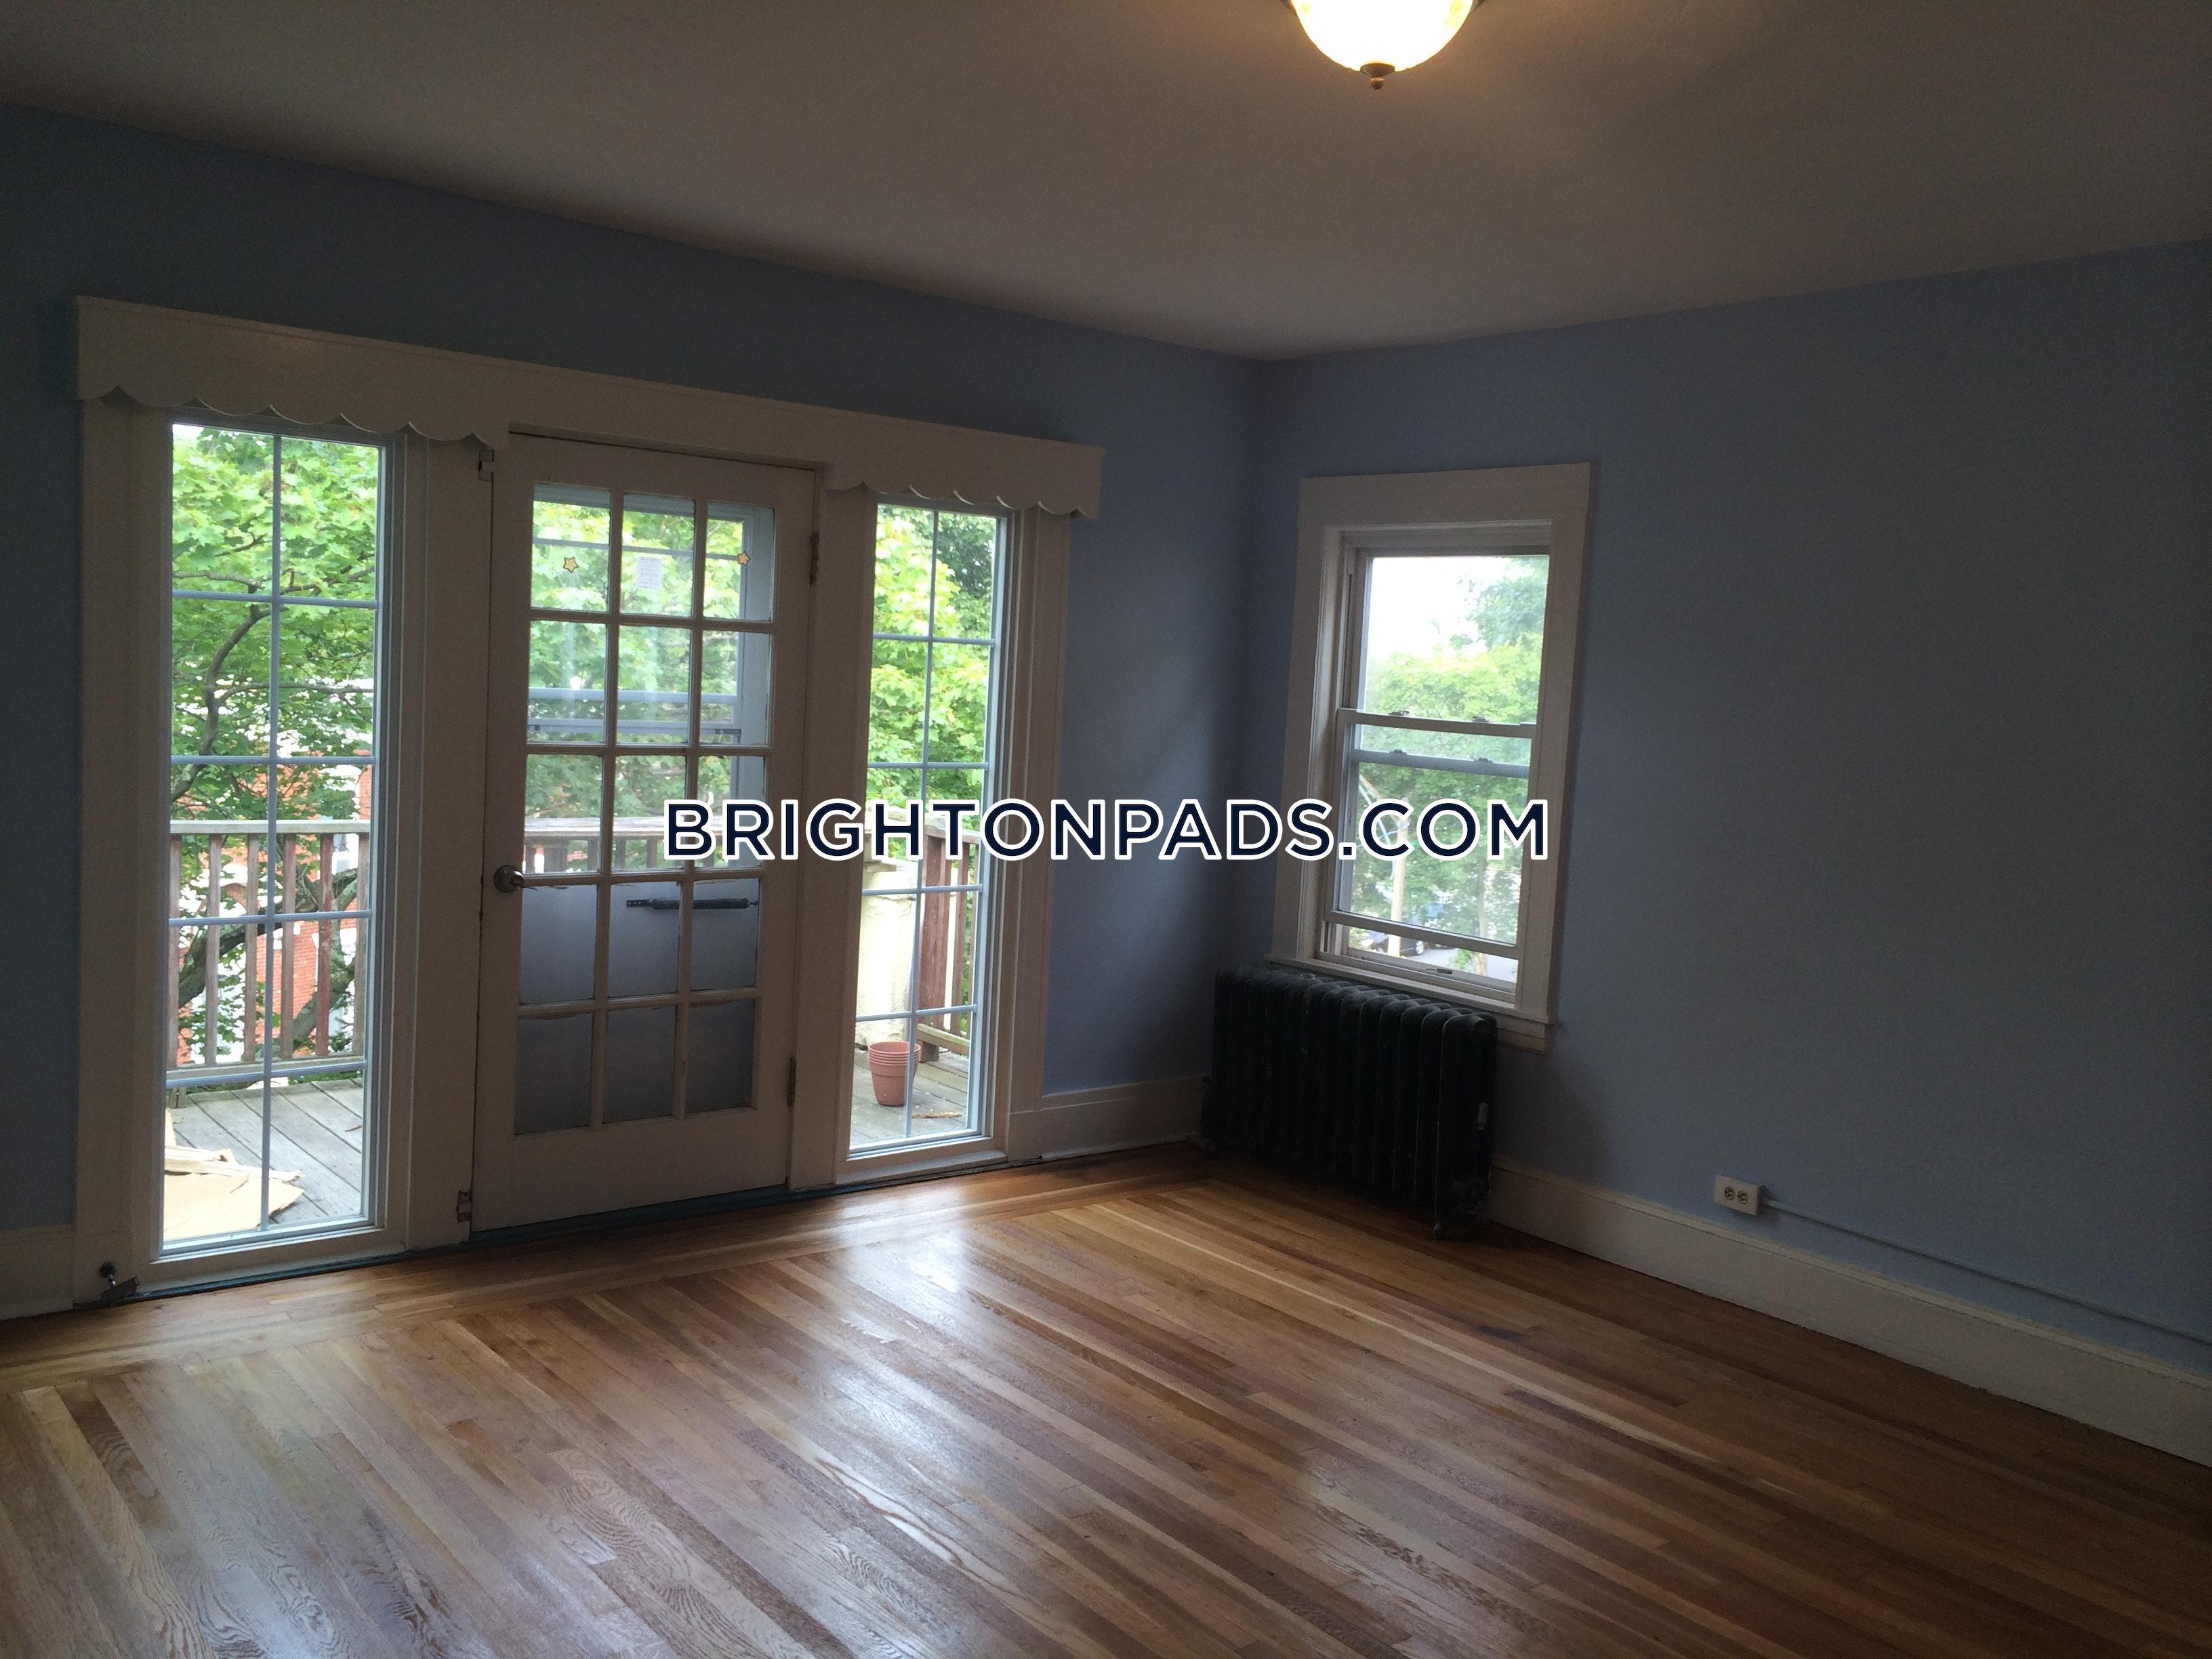 5-beds-2-baths-boston-brighton-boston-college-4350-382109